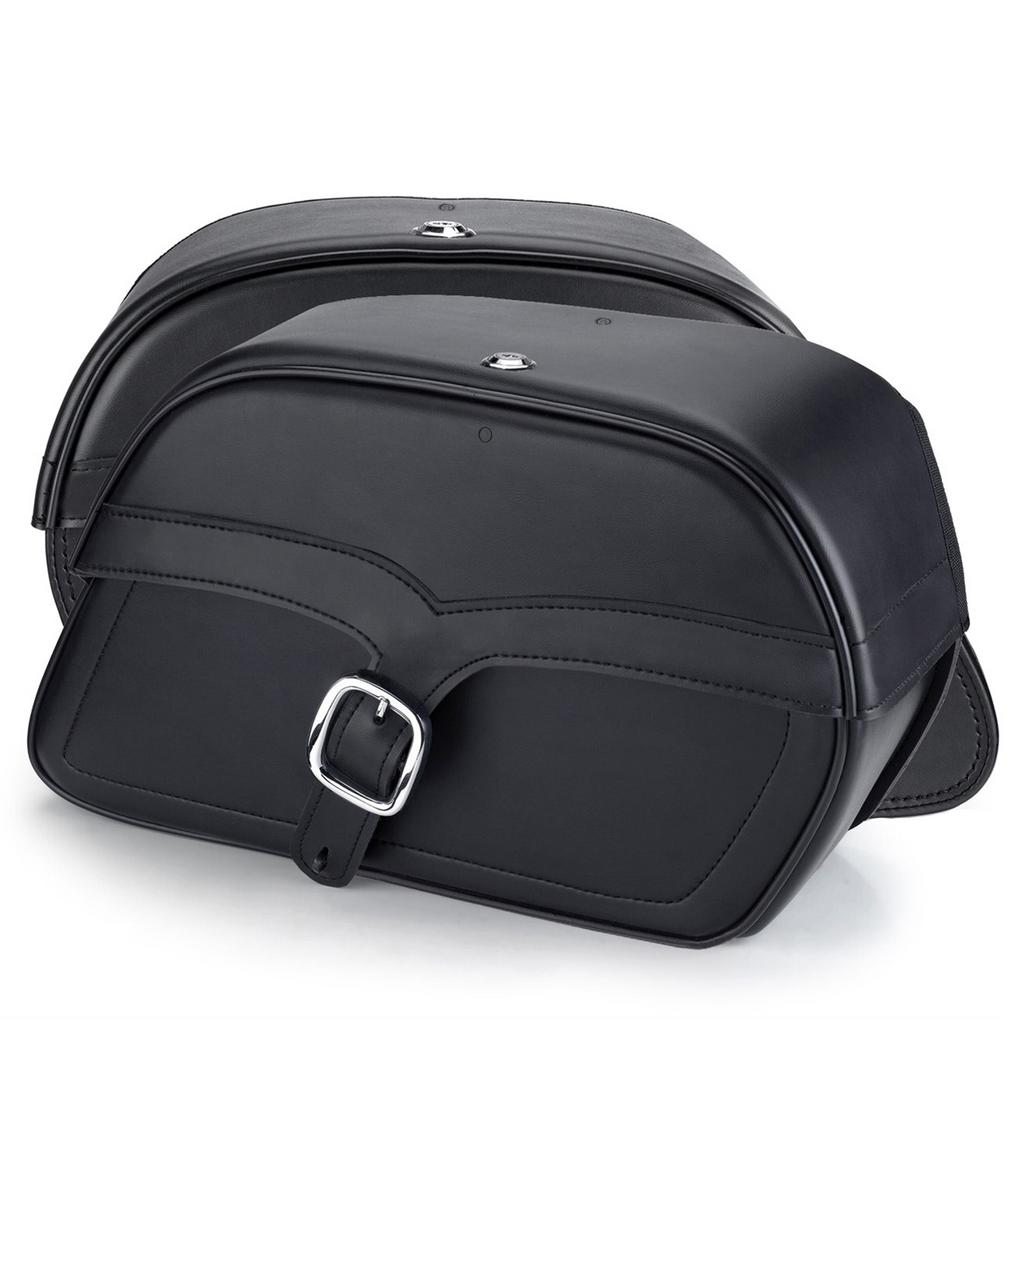 Suzuki Intruder 1500 VL1500 Medium Charger Single Strap Motorcycle Saddlebags Both Bags View